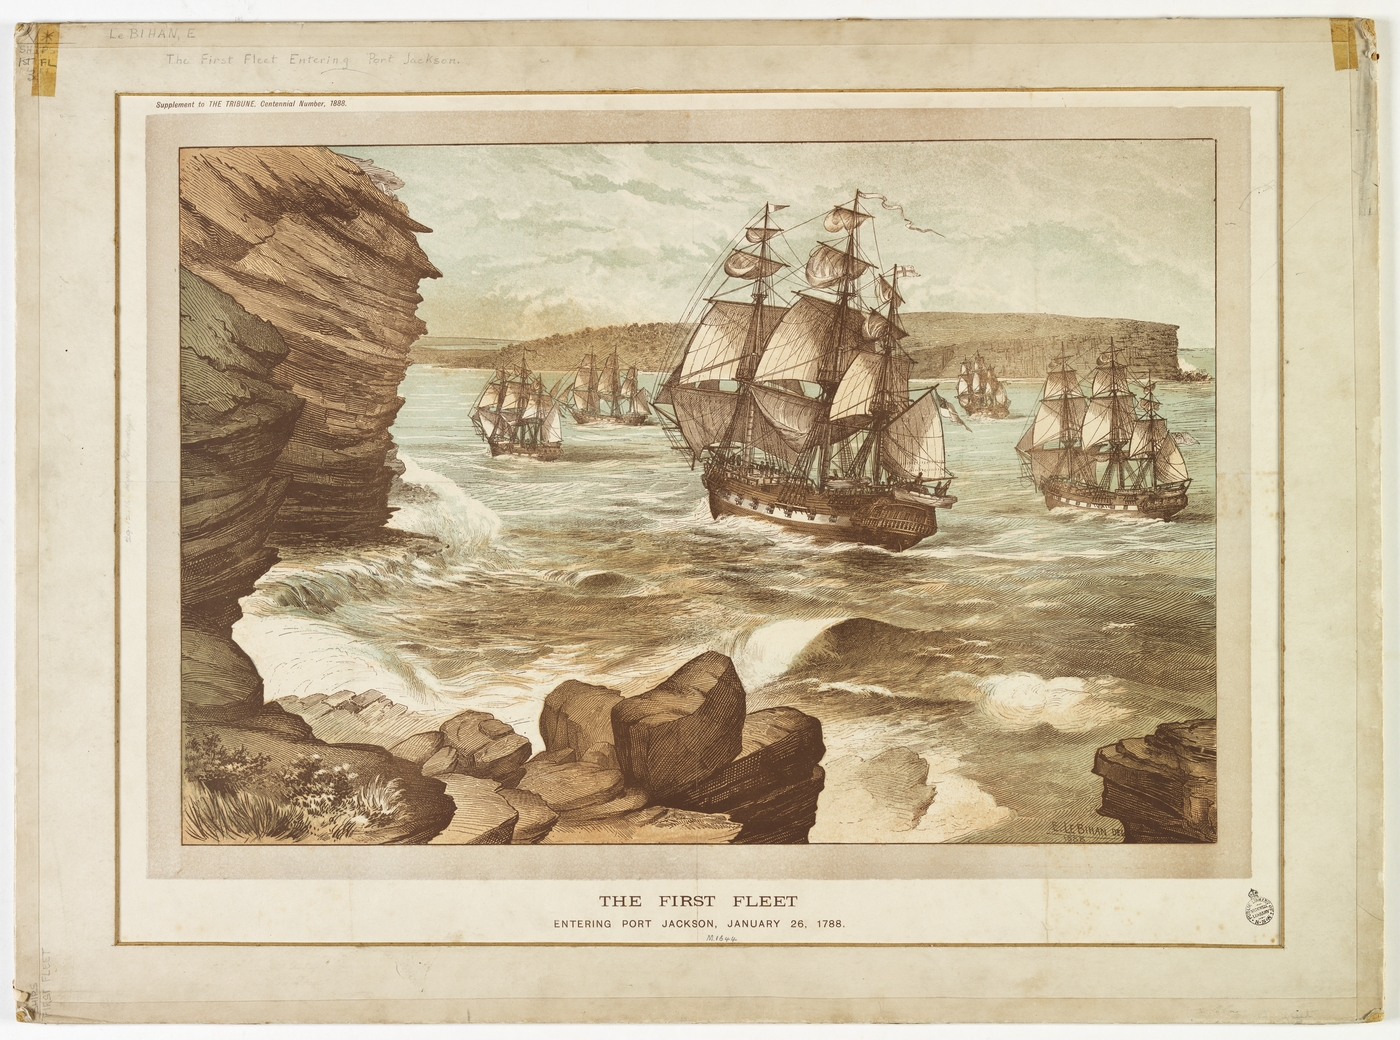 The First Fleet entering Port Jackson (Wikipedia)